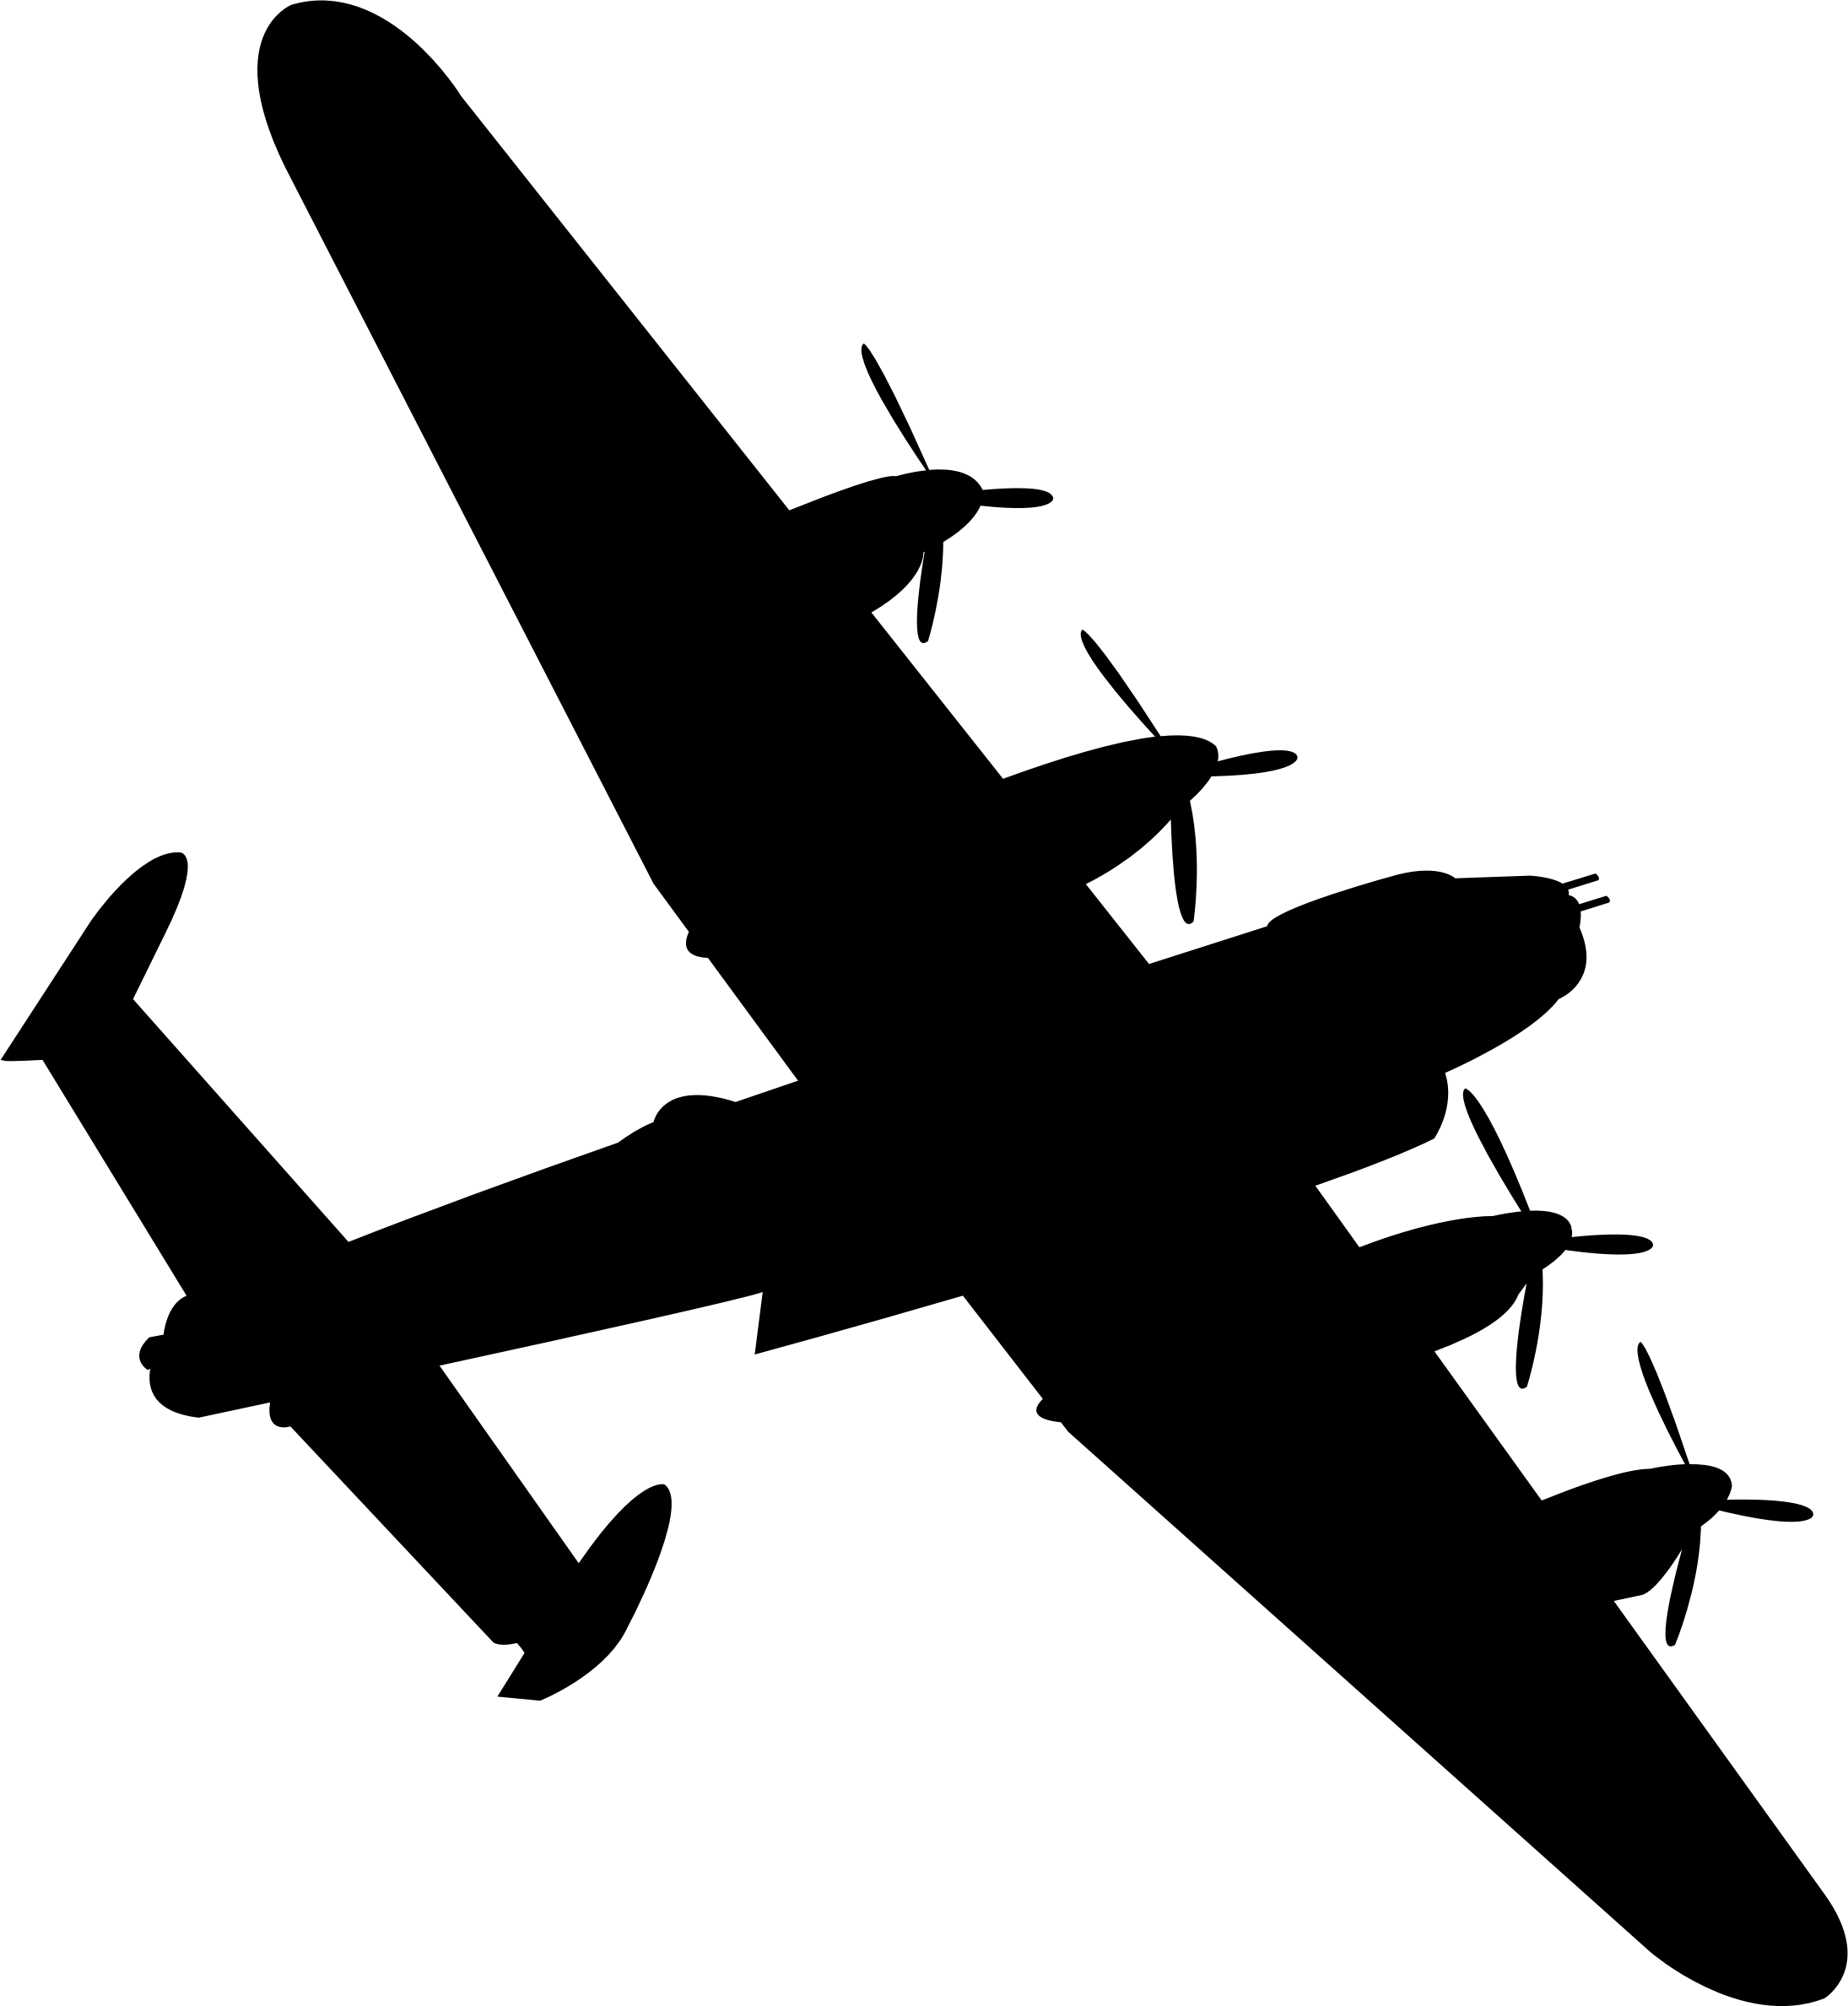 Lancaster Bomber Black Silhouette Vector Clipart Image Free